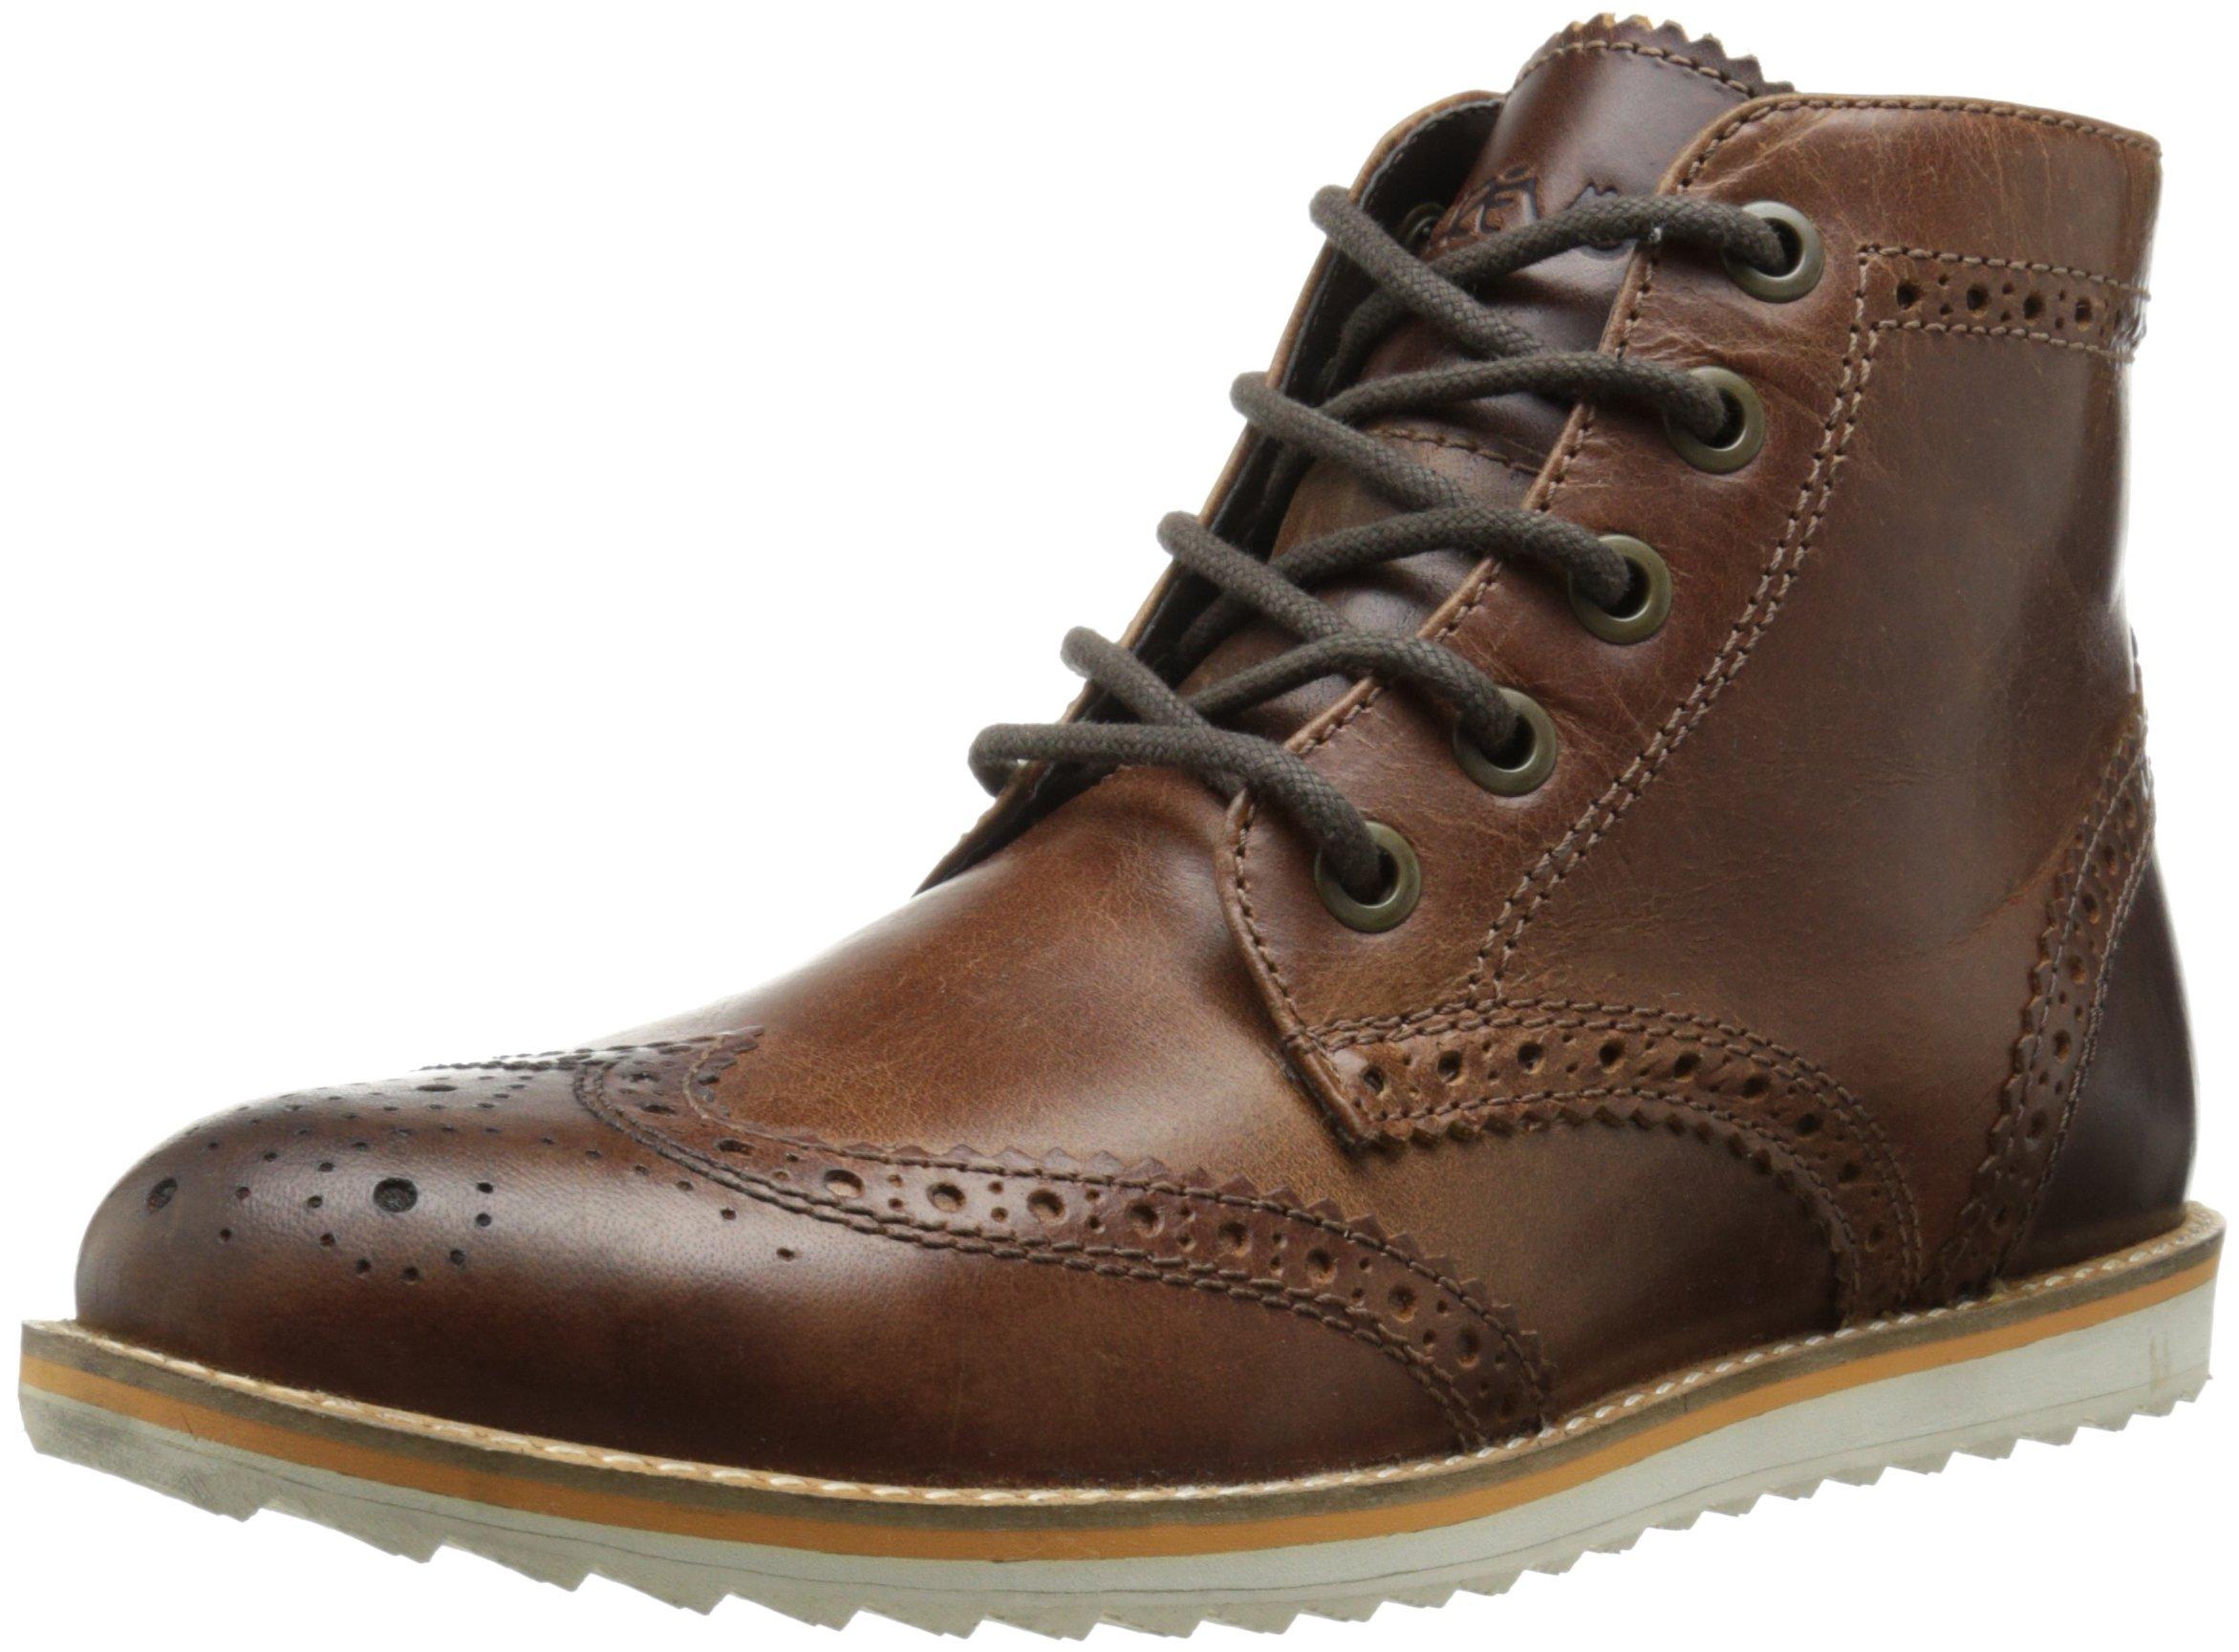 Crevo Men's Boardwalk Wing Tip Boot, Brown Leather, 10 M US by Crevo